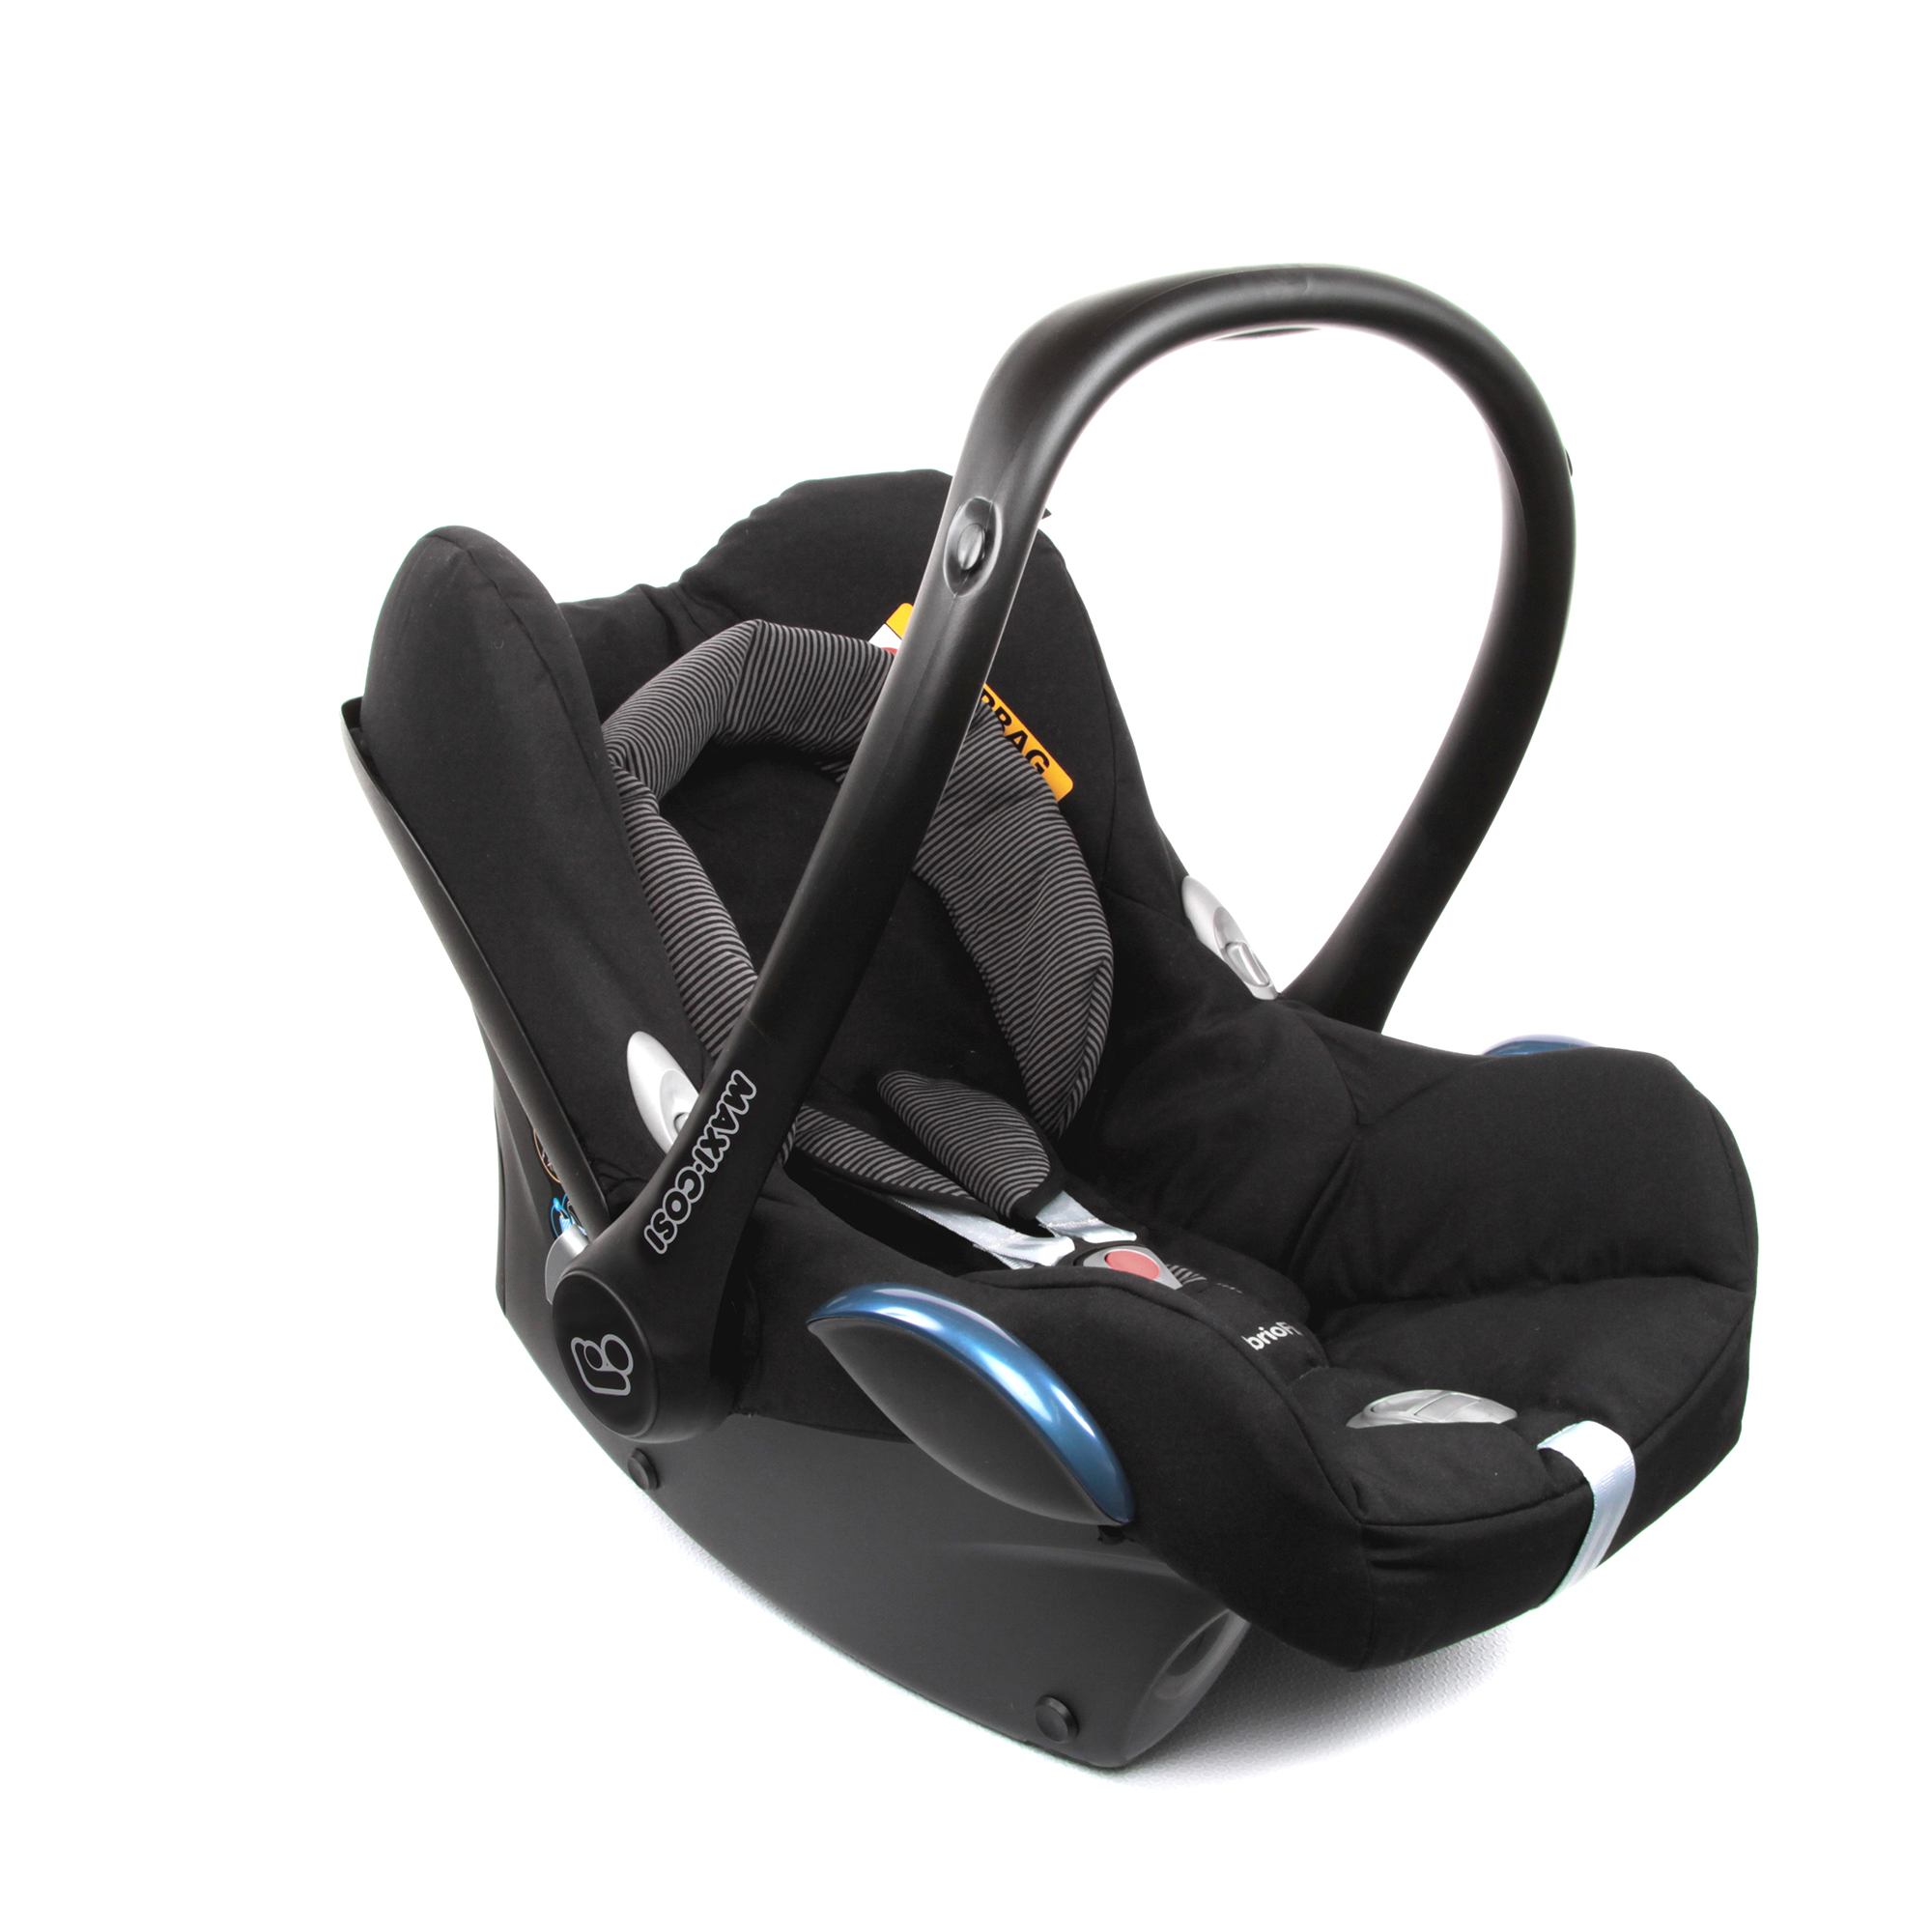 maxi cosi infant car seat cabriofix 2017 black raven buy at kidsroom car seats. Black Bedroom Furniture Sets. Home Design Ideas